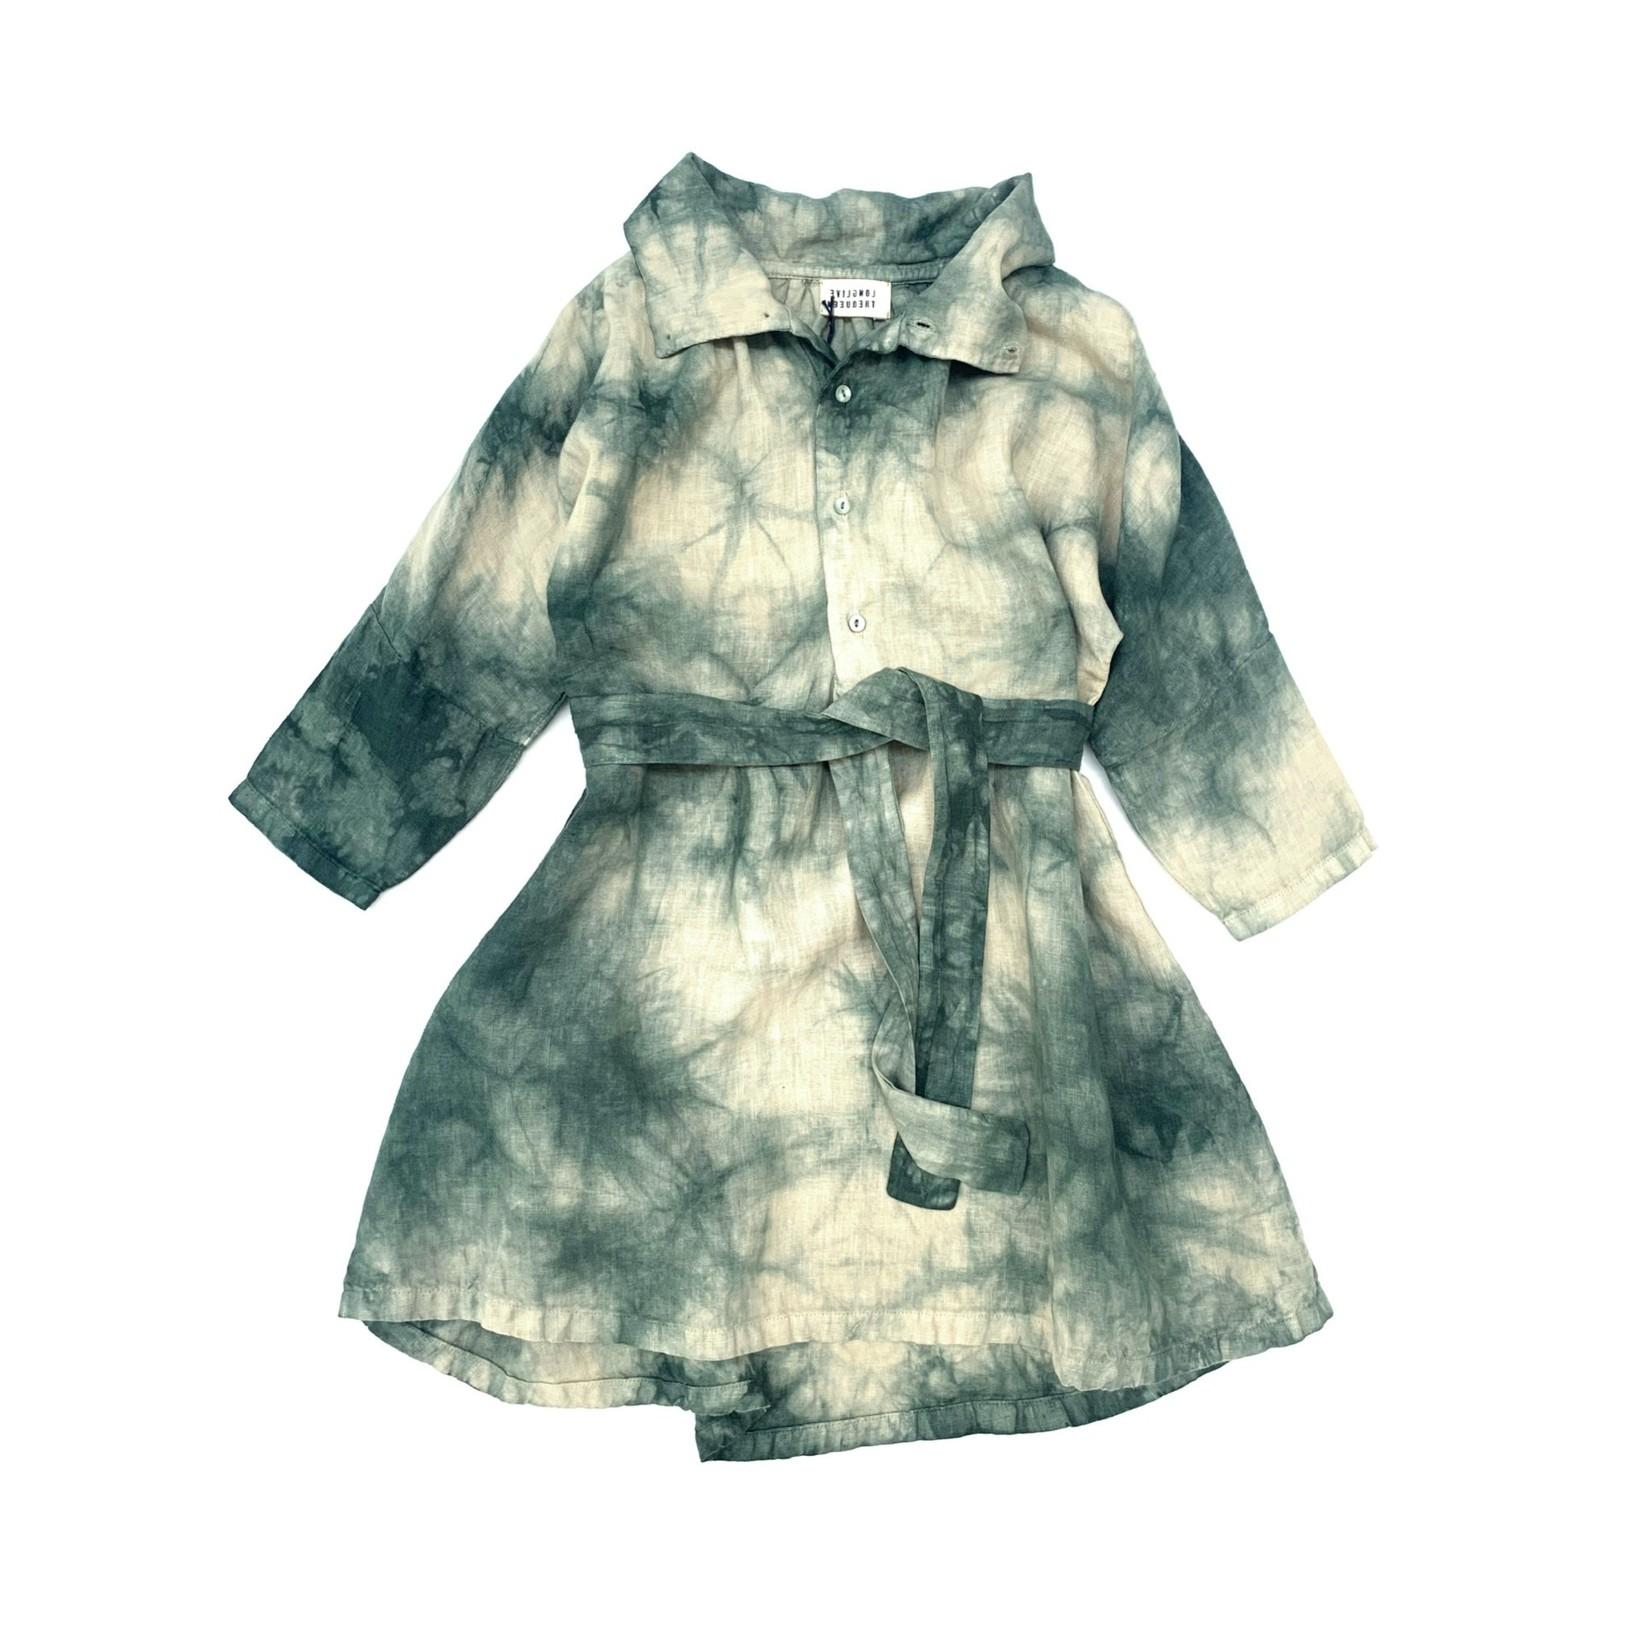 LONG LIVE THE QUEEN Long live the queen linen dress